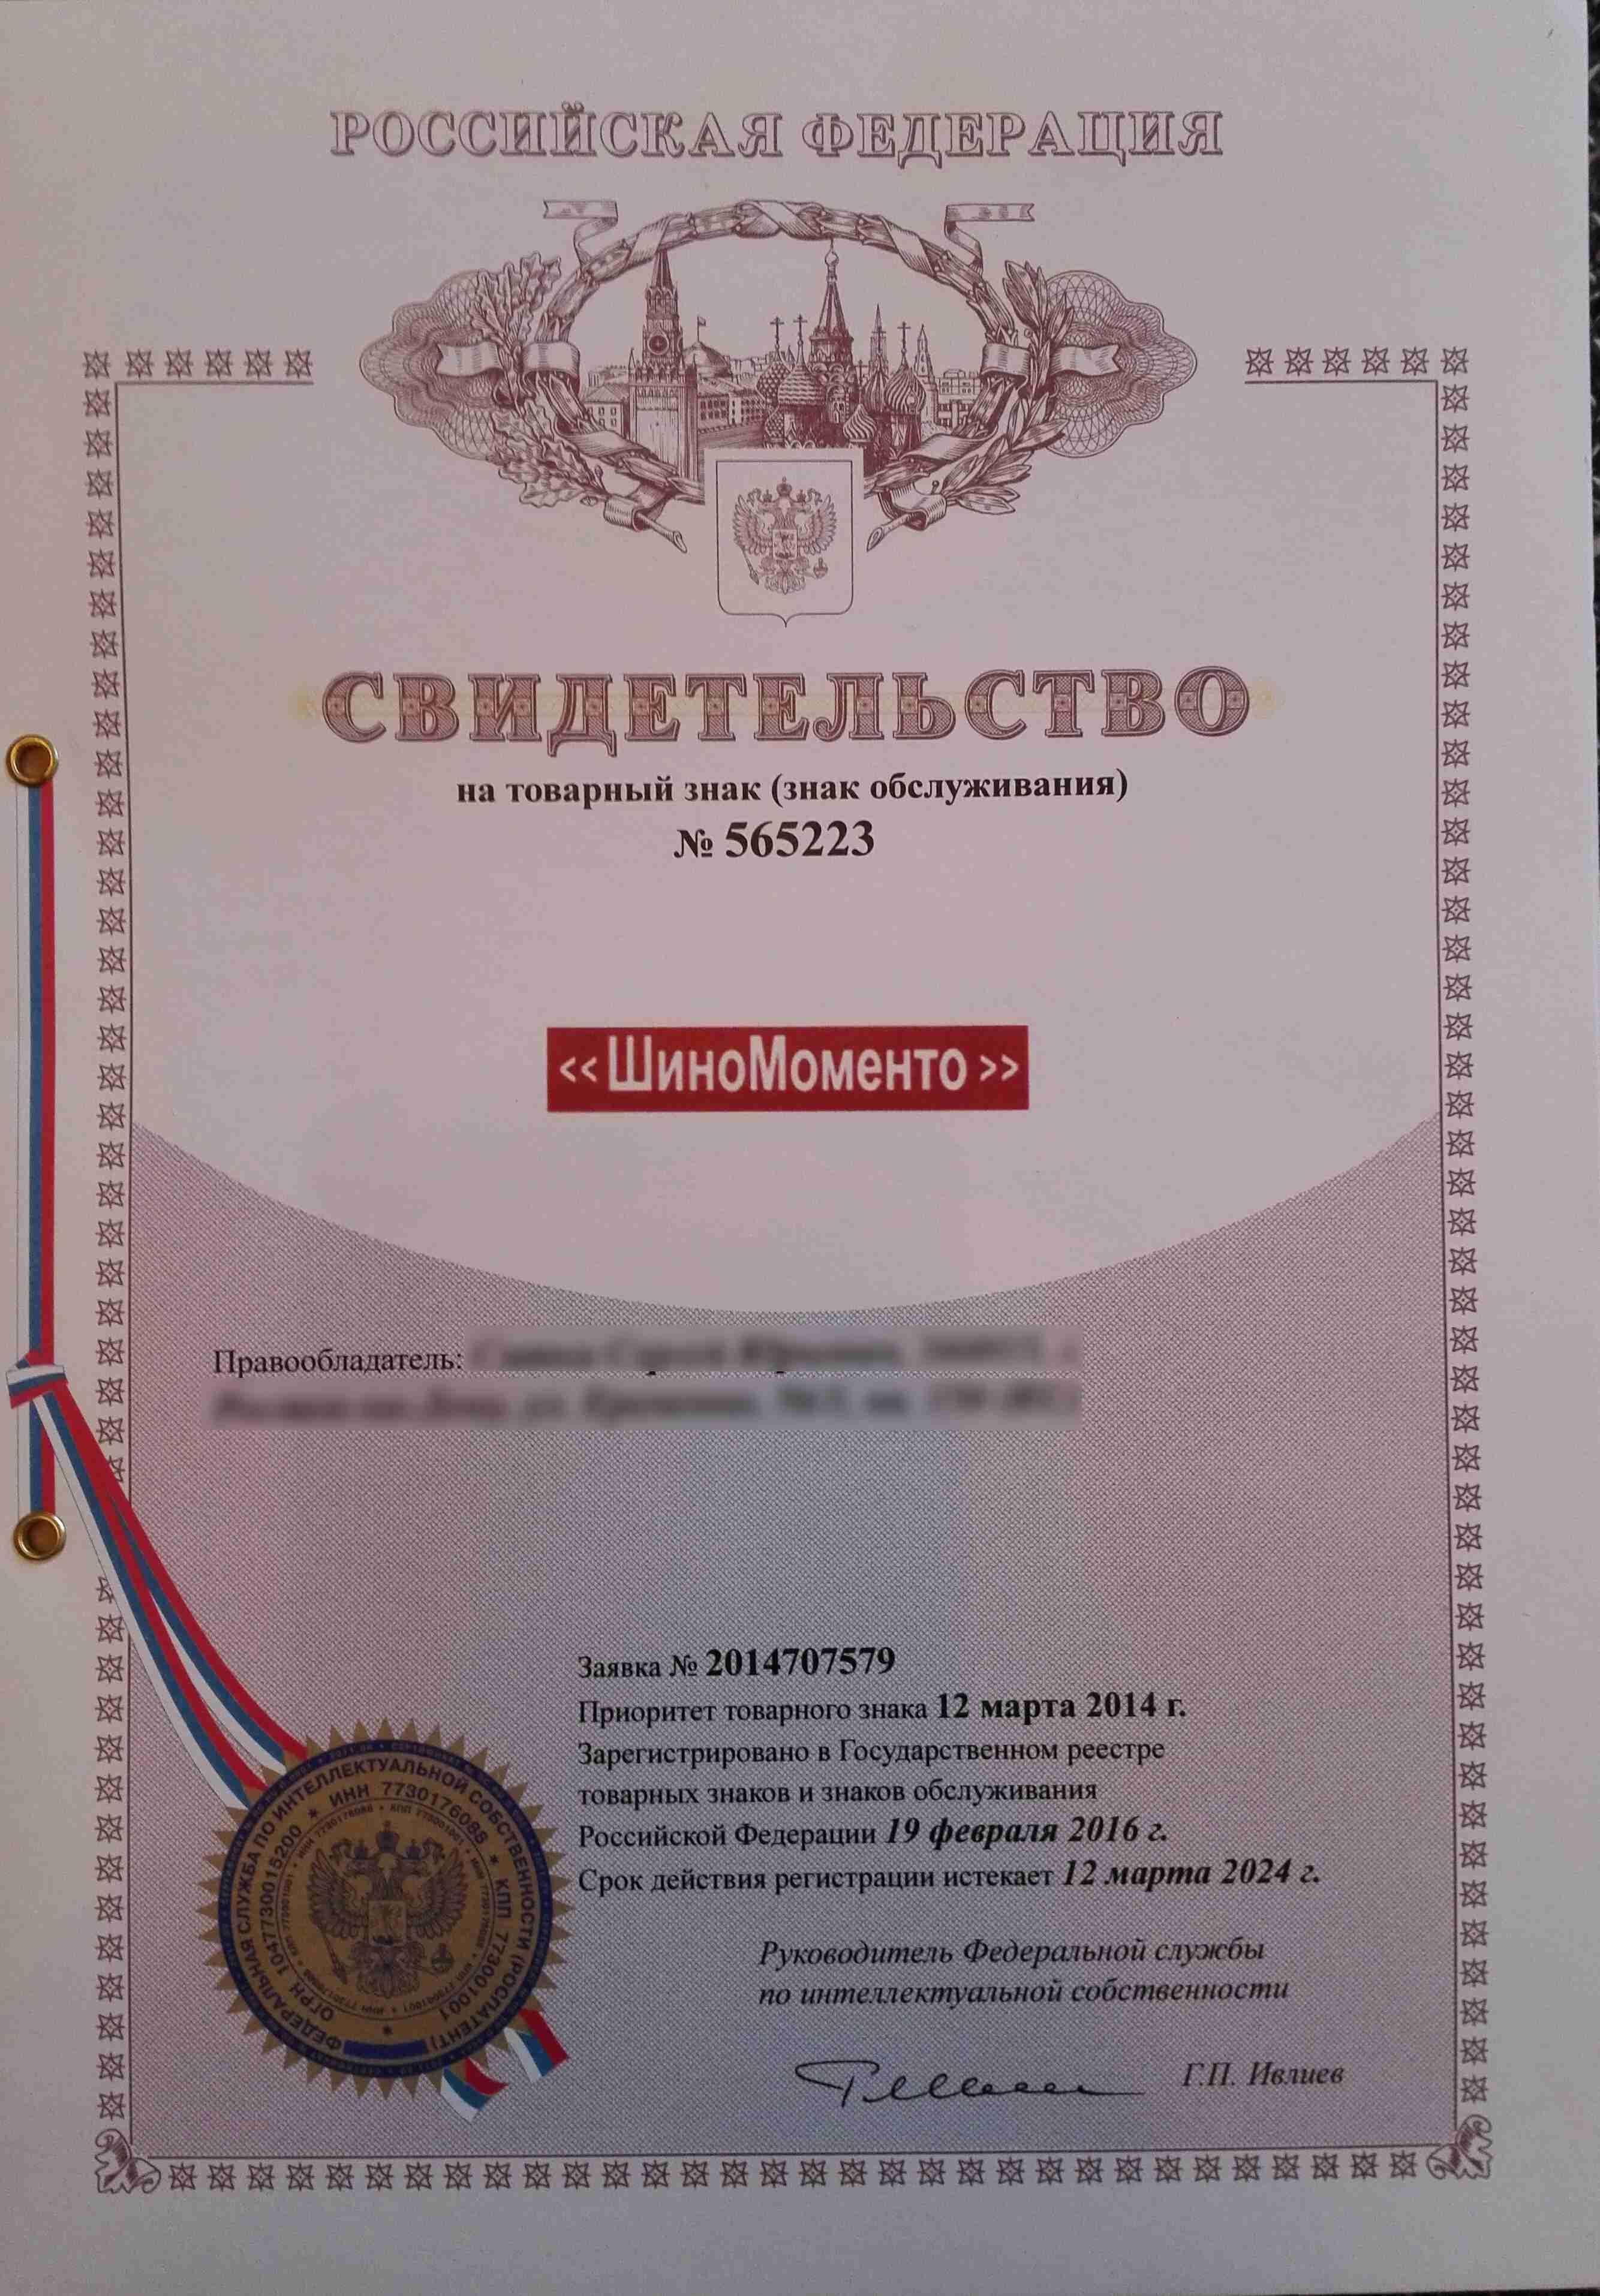 Регистрация товарного знака Шиномоменто